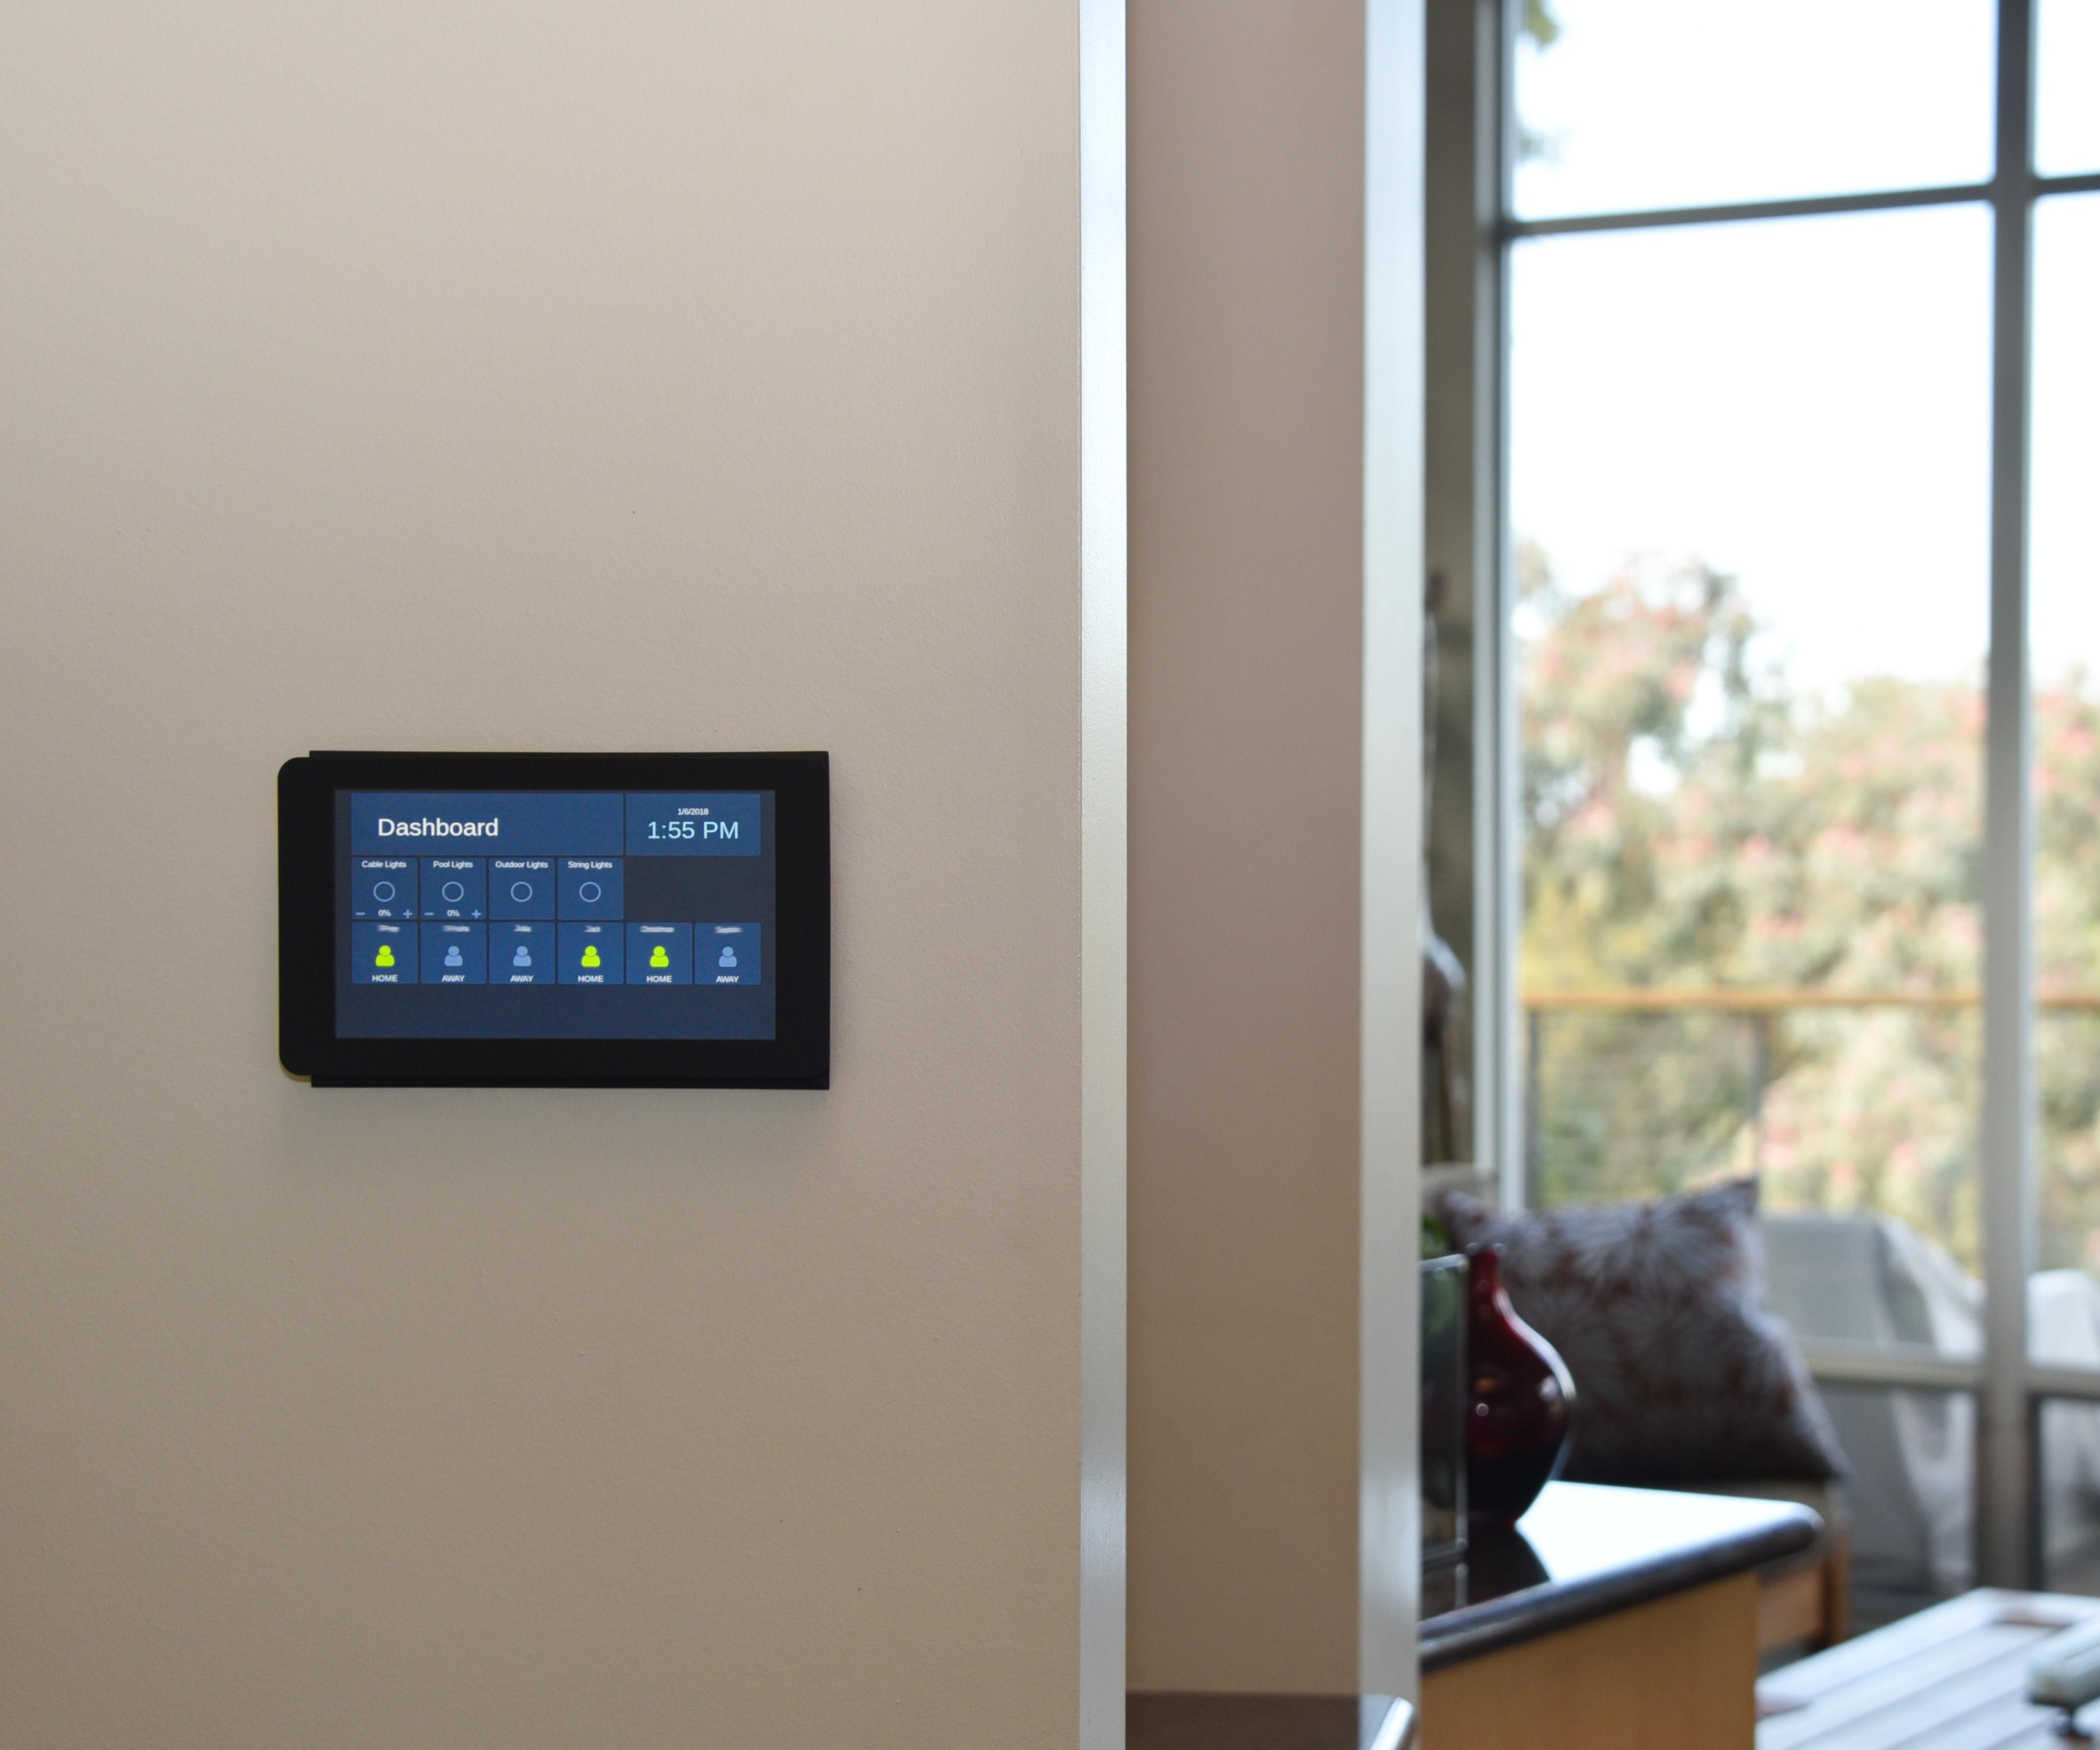 Flush Wall-Mounted Raspberry Pi Touchscreen